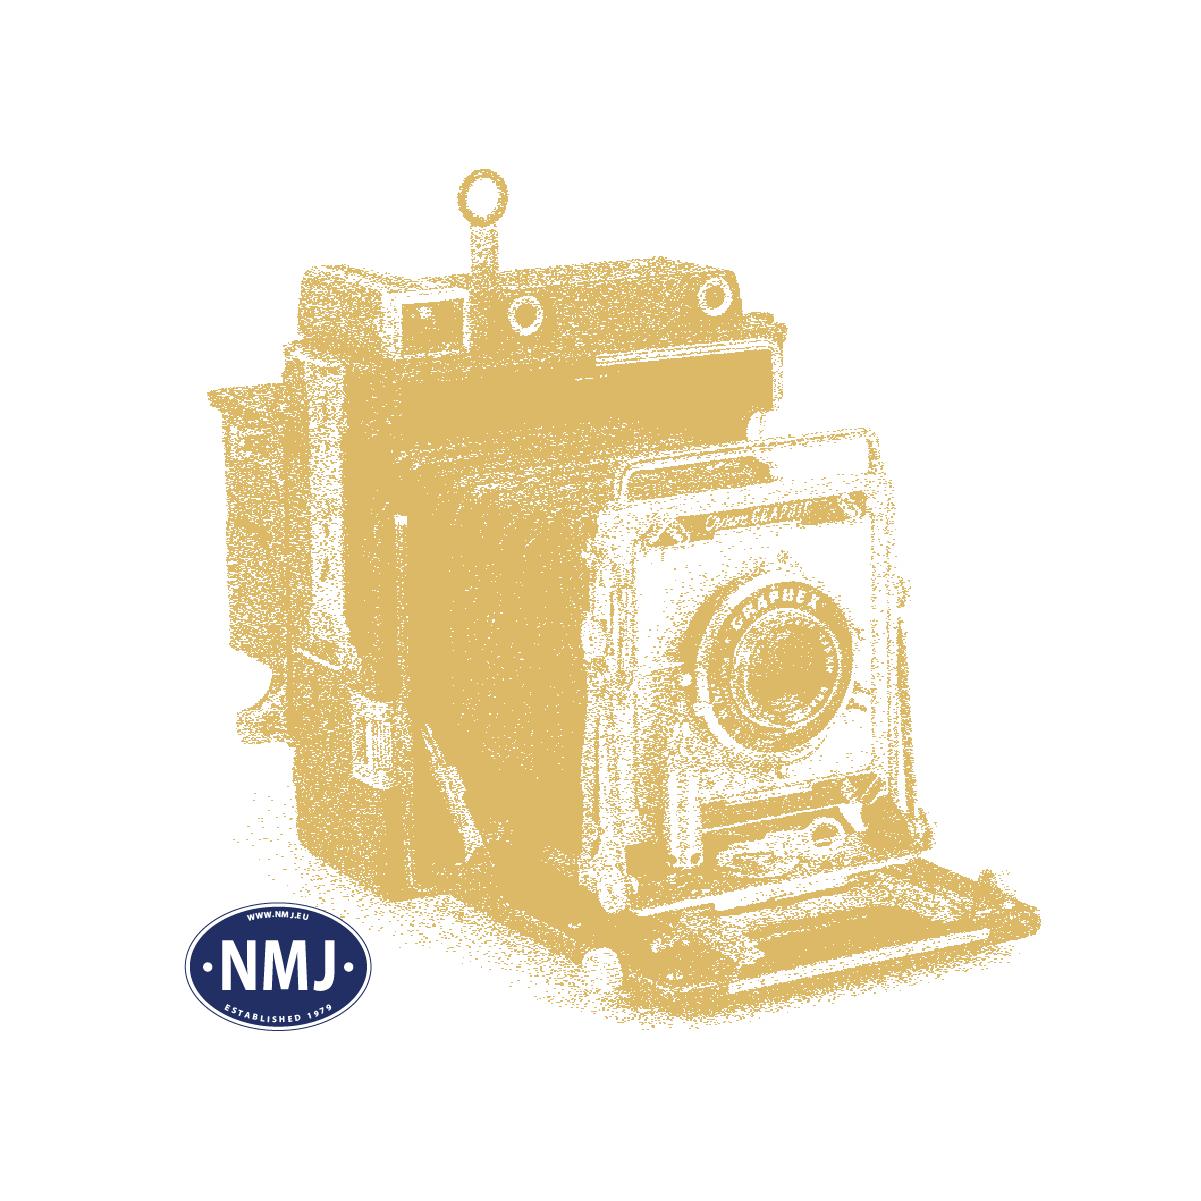 BRA40853 - NSB Schlepptenderlok Type 61a 3431, AC Digital